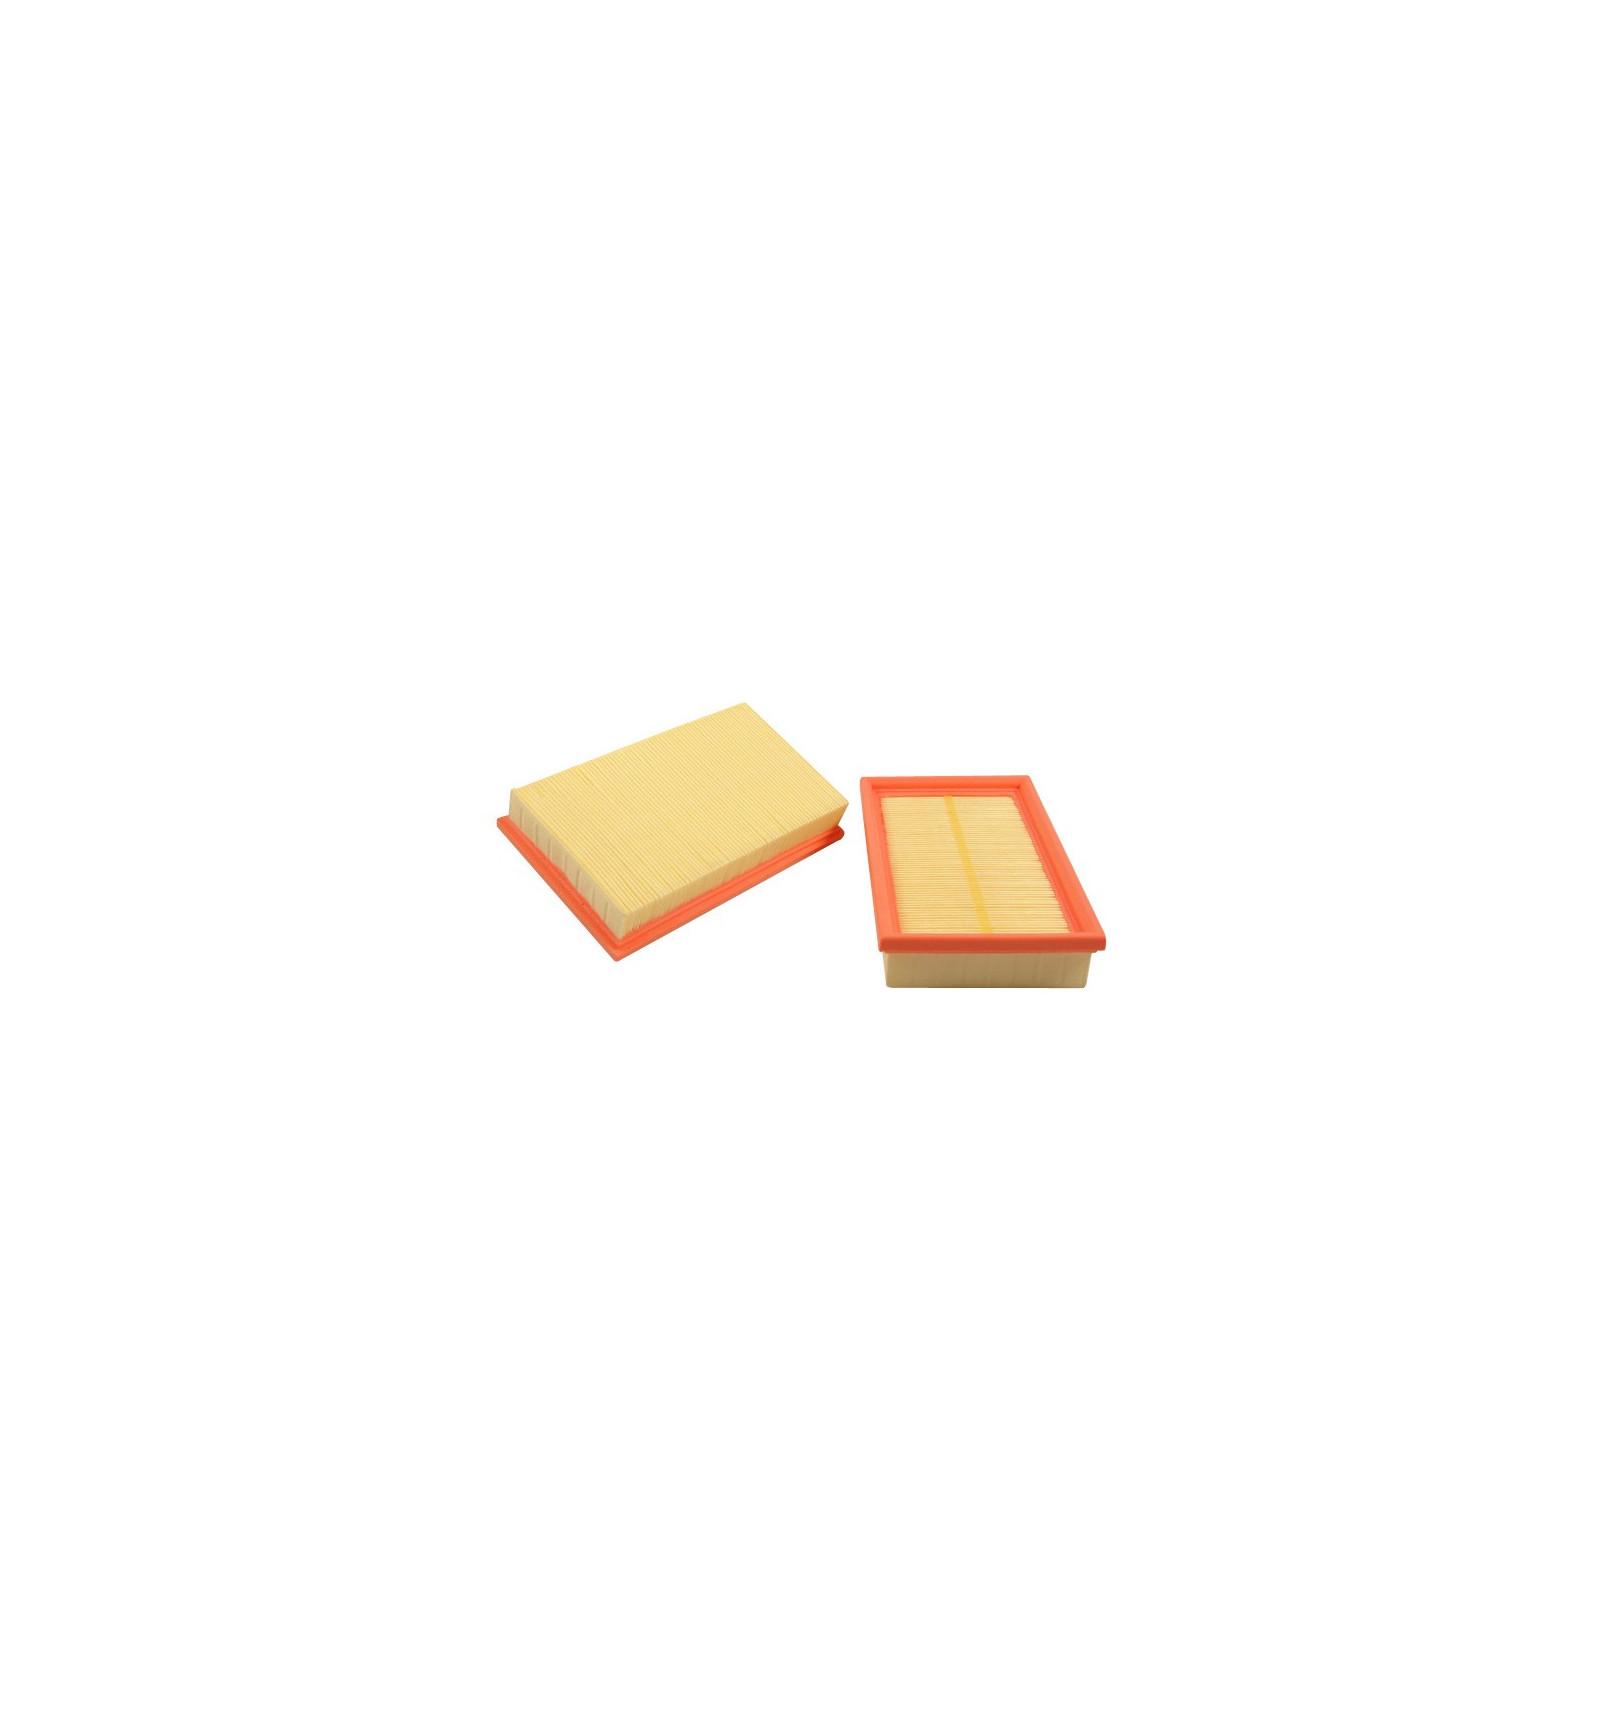 filtre a air renault clio 3 modus nissan juke micra 1 5dci origine pieces auto. Black Bedroom Furniture Sets. Home Design Ideas